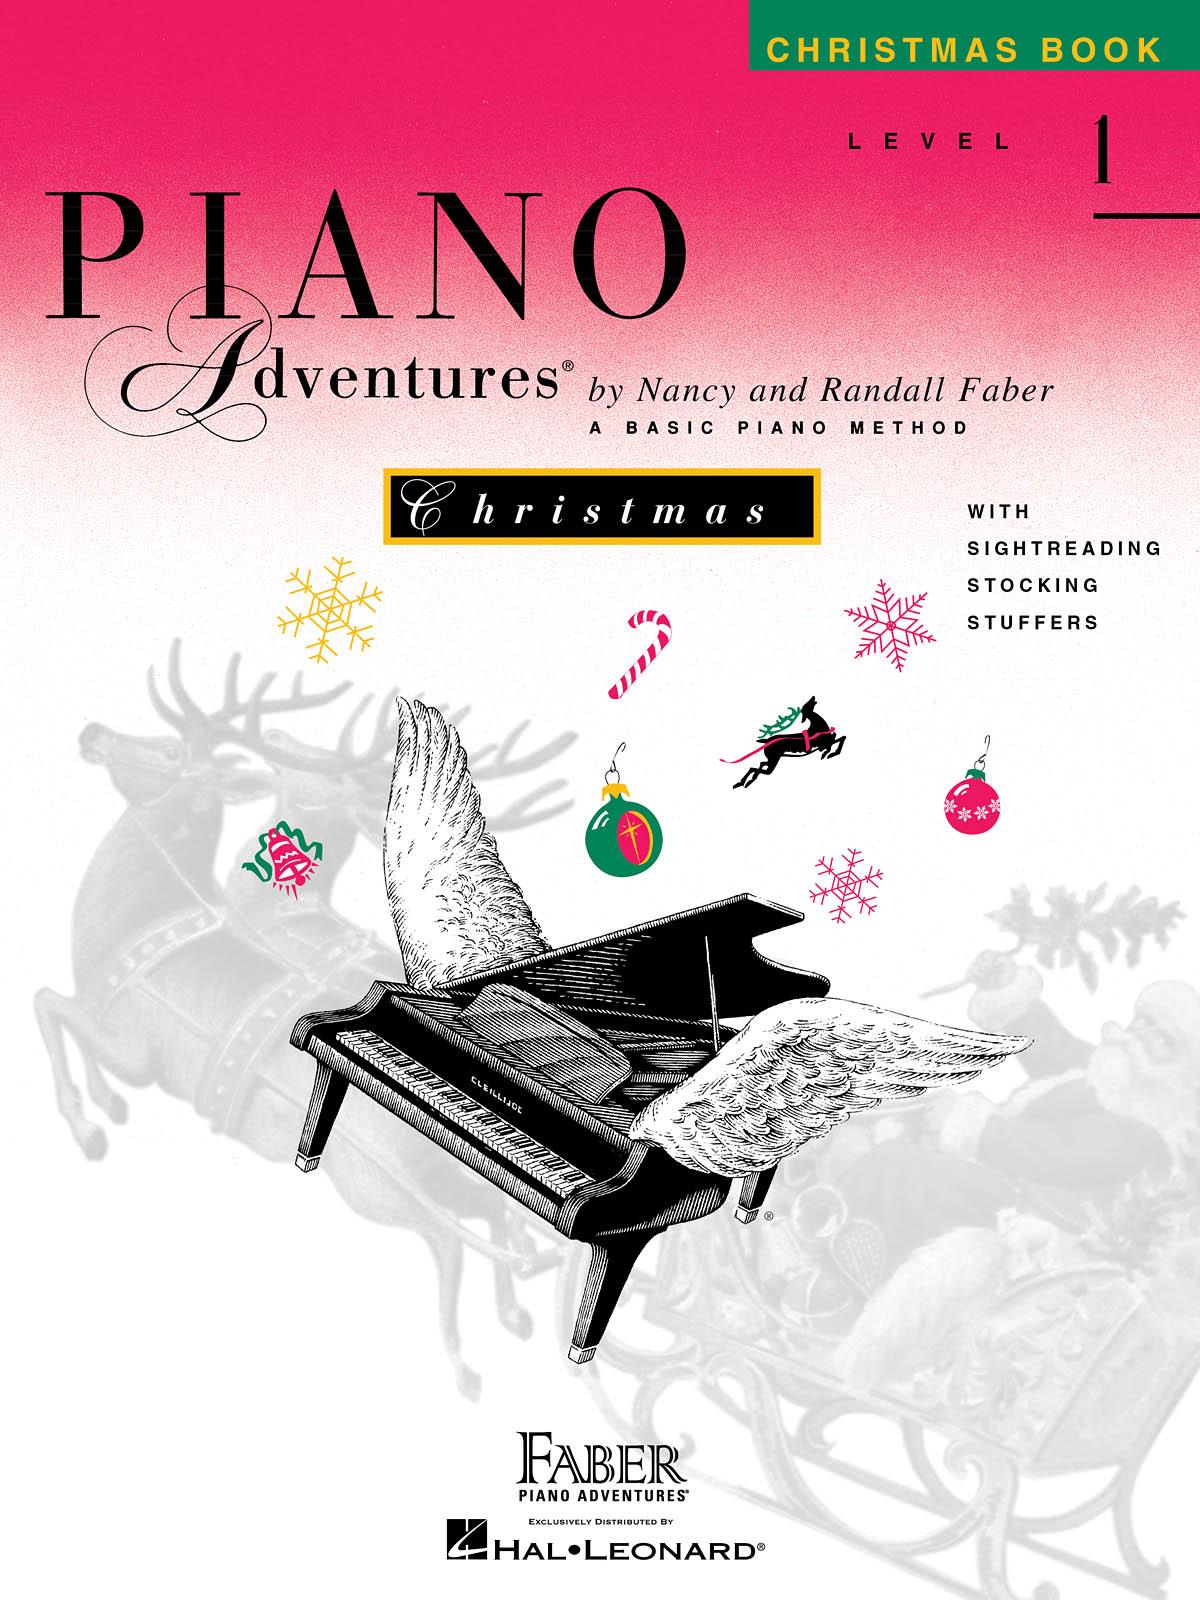 Faber Piano Adventures, Christmas Book, Level 1